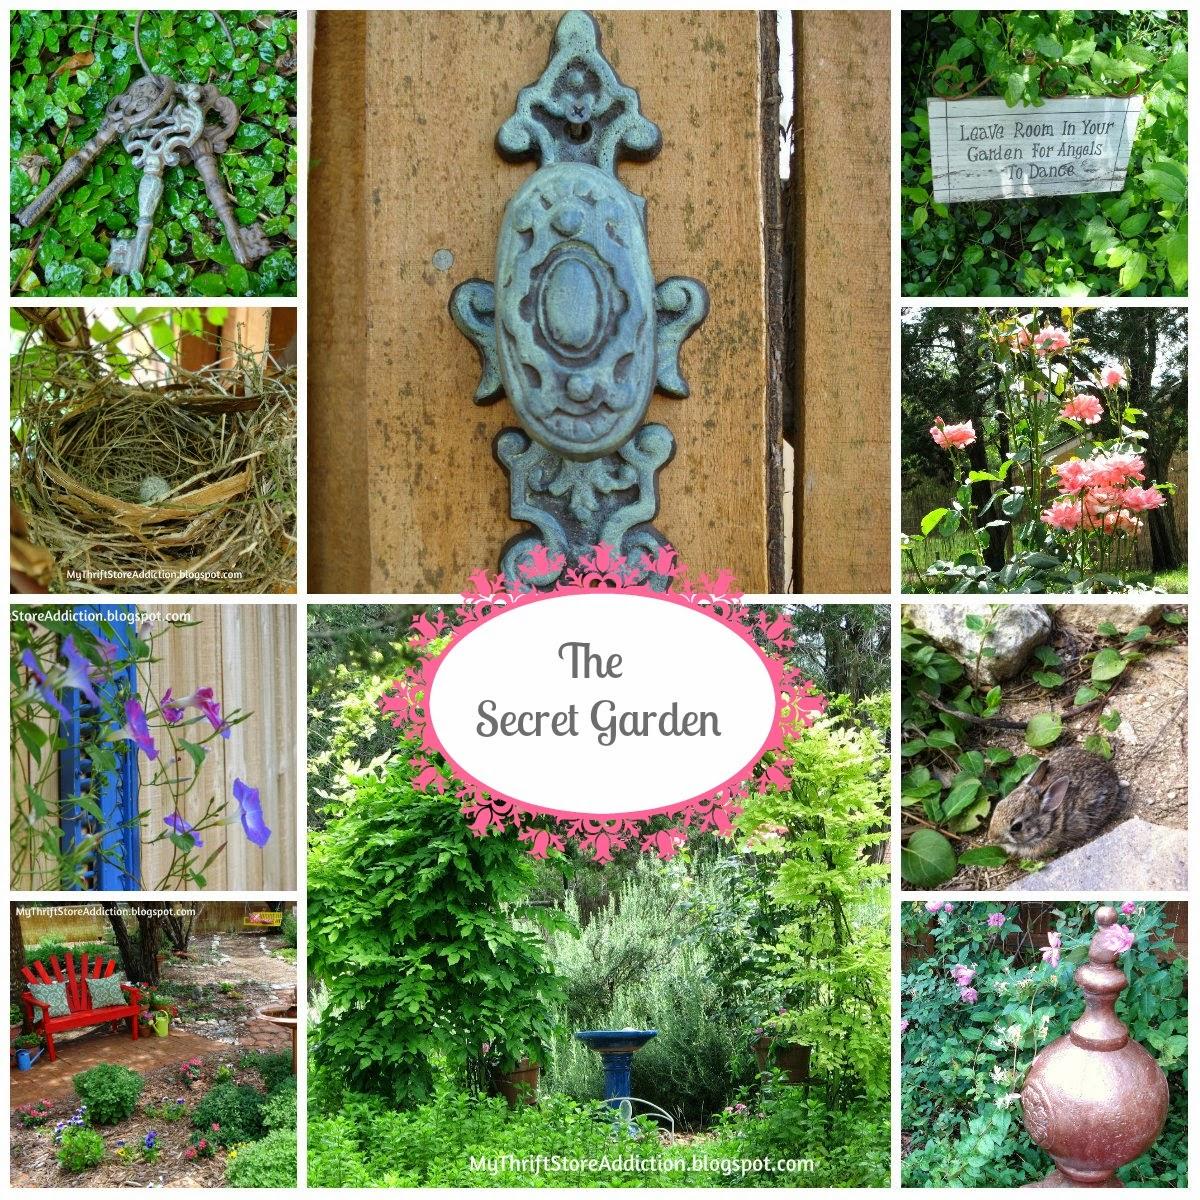 http://mythriftstoreaddiction.blogspot.com/2014/07/welcome-to-secret-garden.html